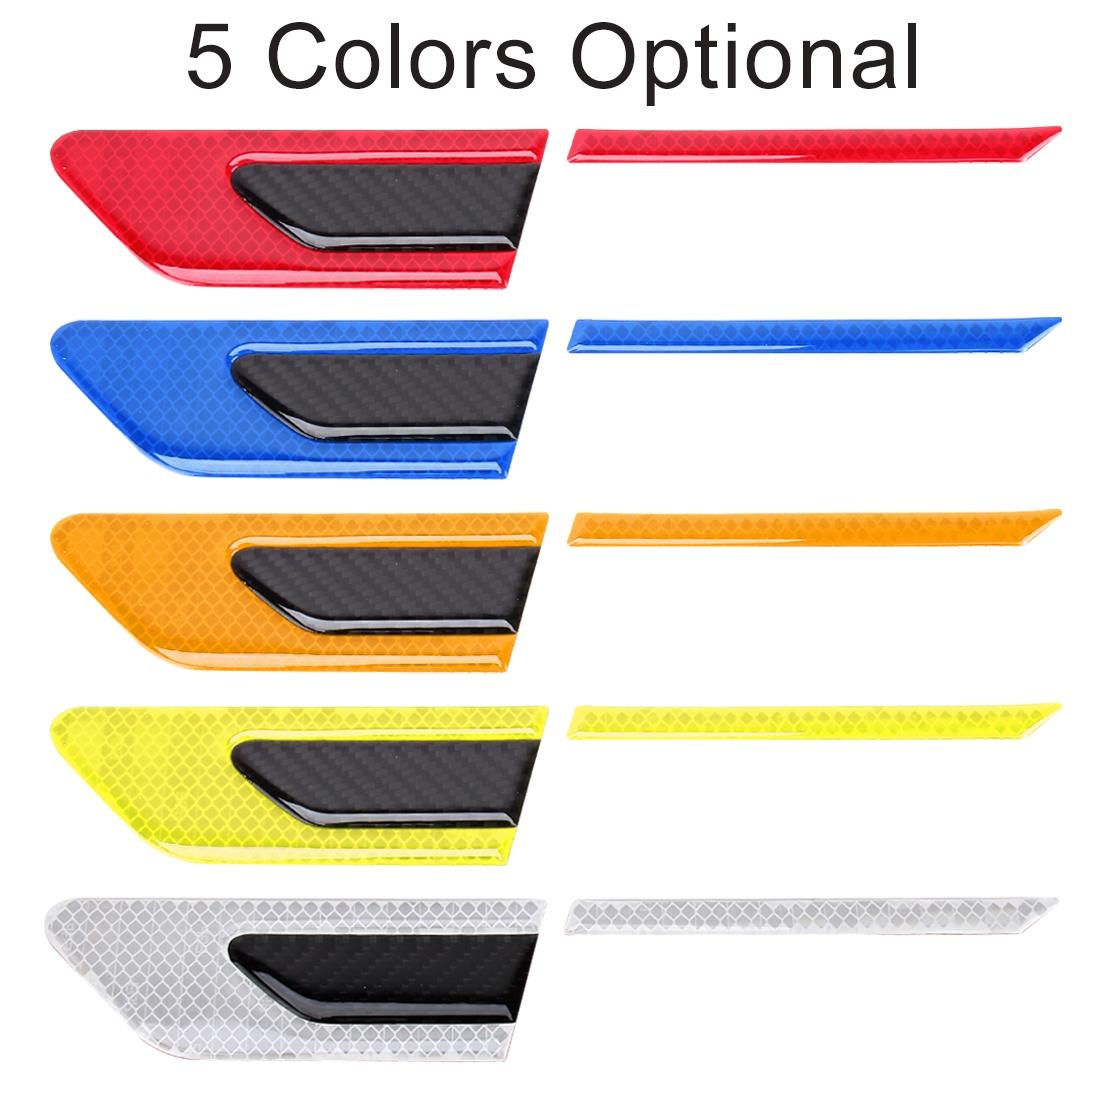 2 PCS Carbon Fiber Car-Styling Fender Reflective Bumper Decorative Strip, External Reflection + Inner Carbon Fiber (White)